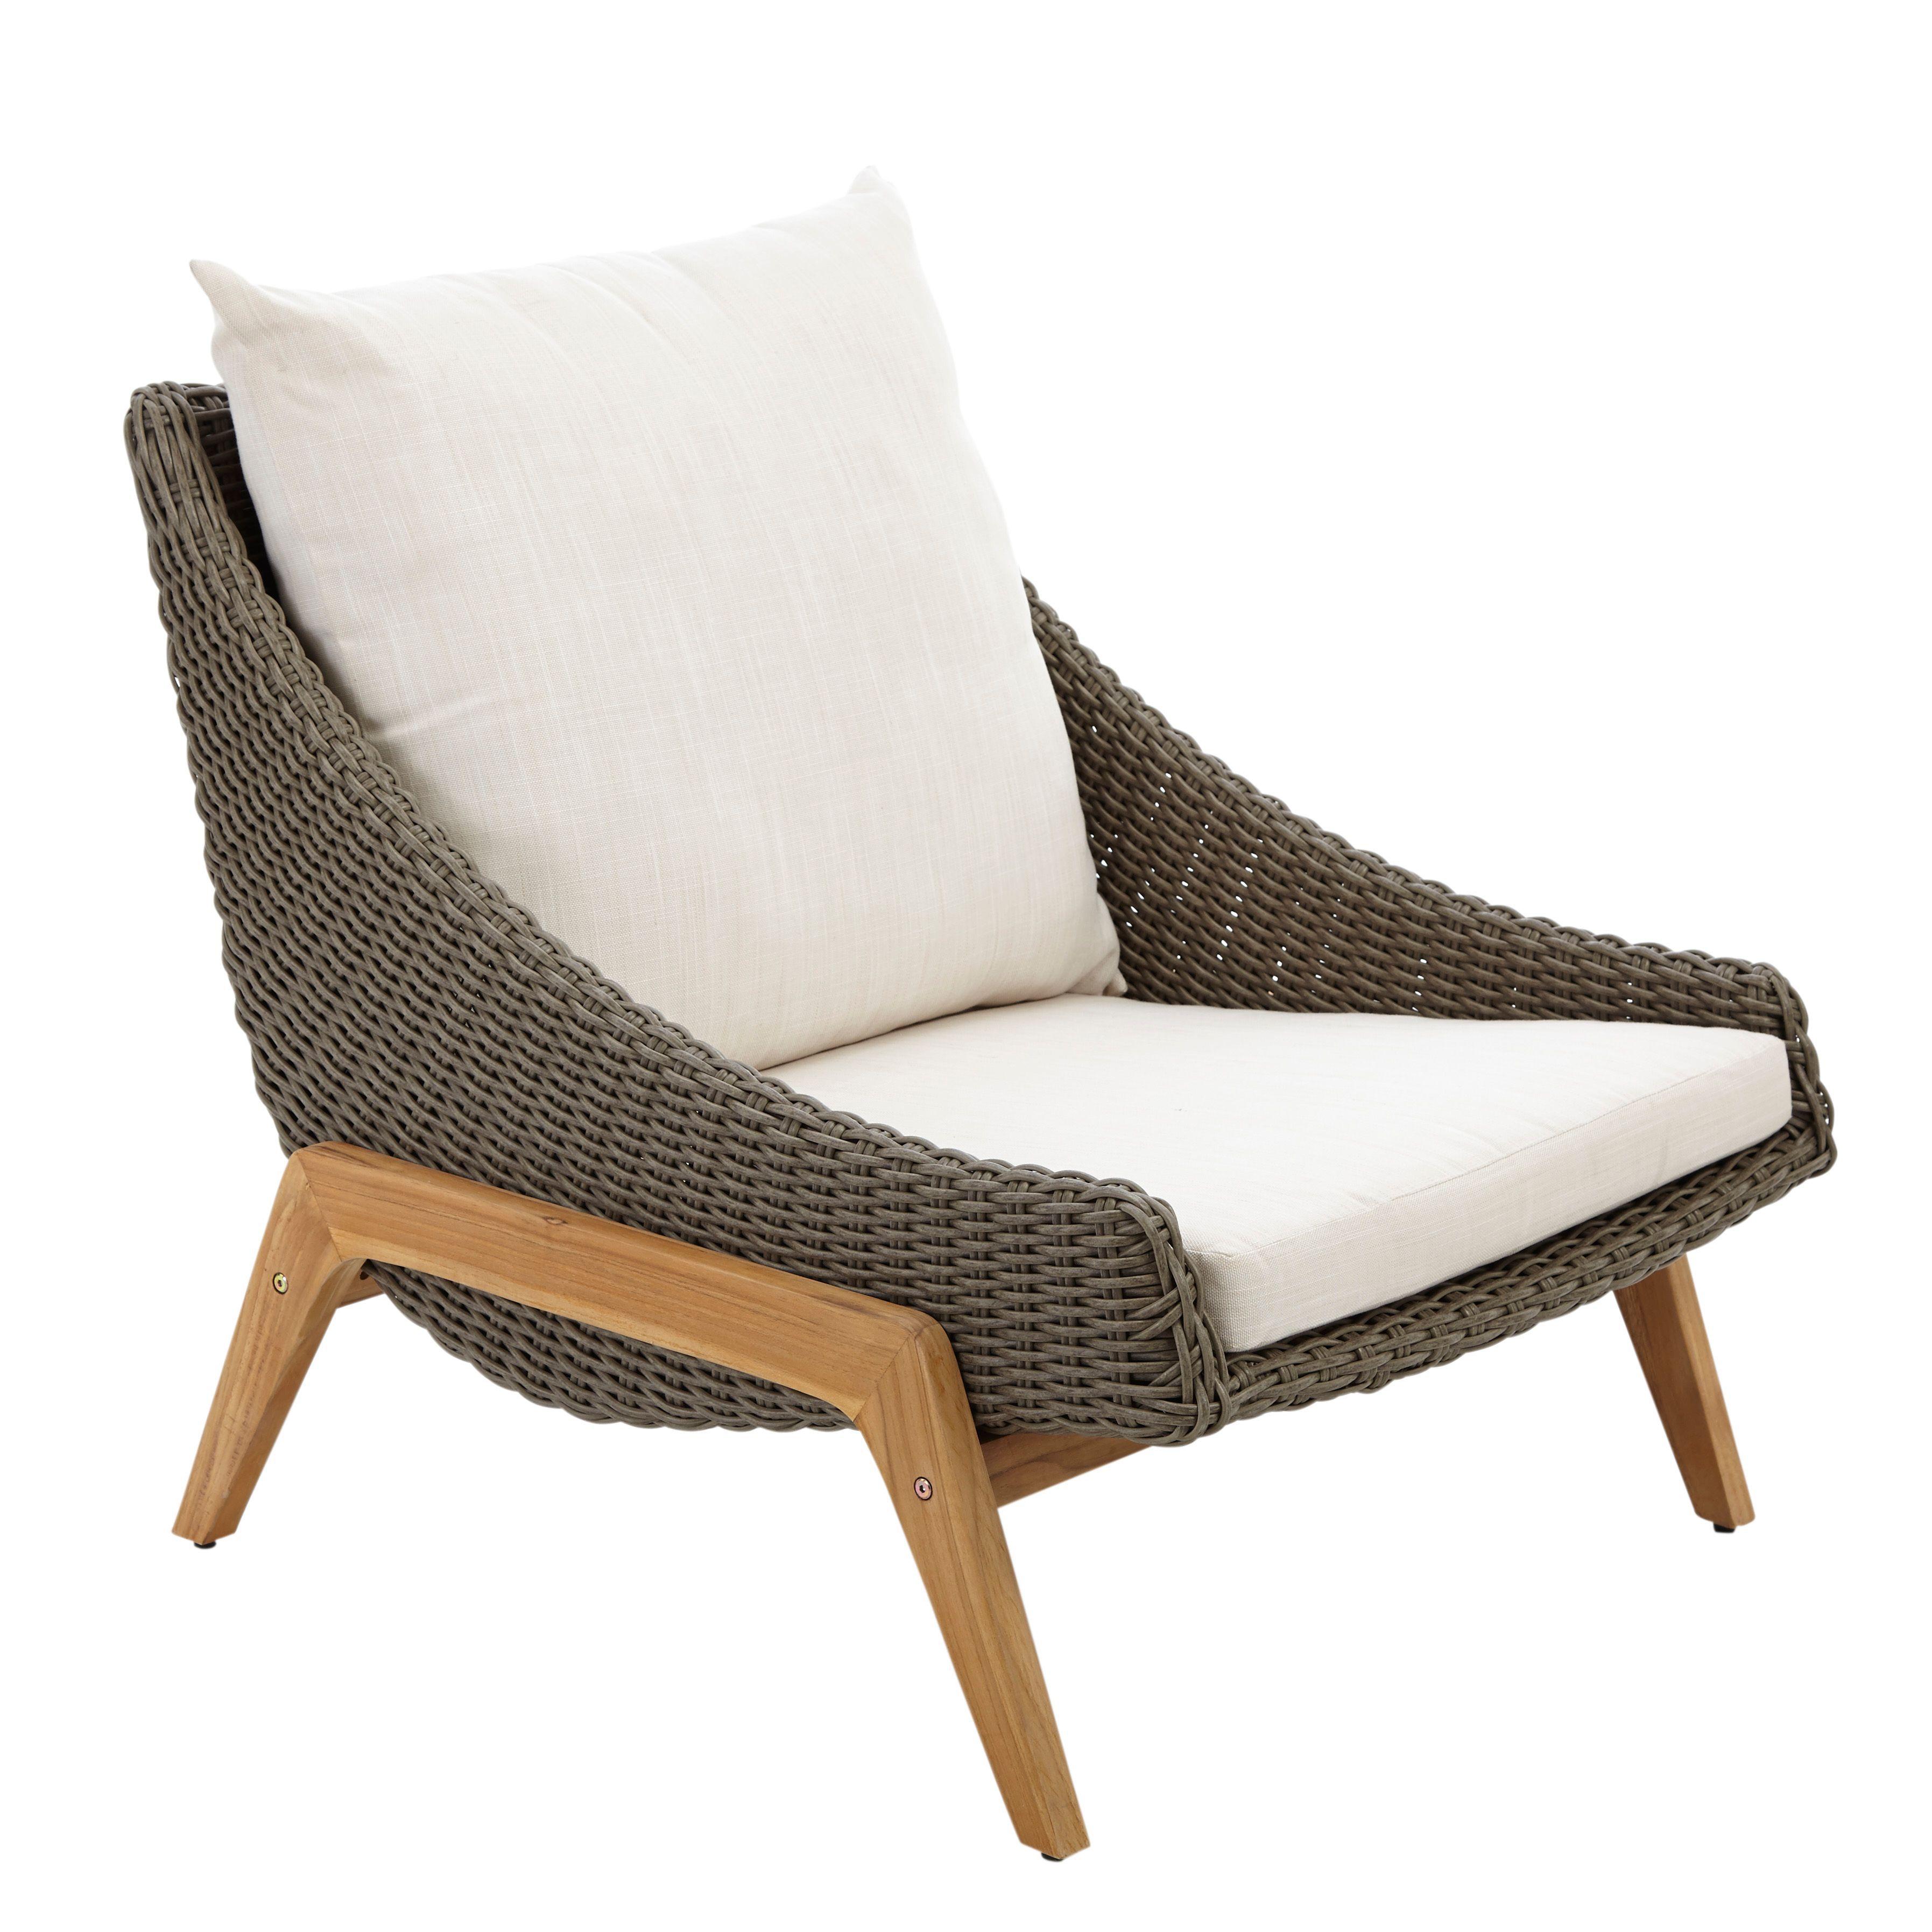 Retro Coffee Chair | Departments | DIY at B&Q